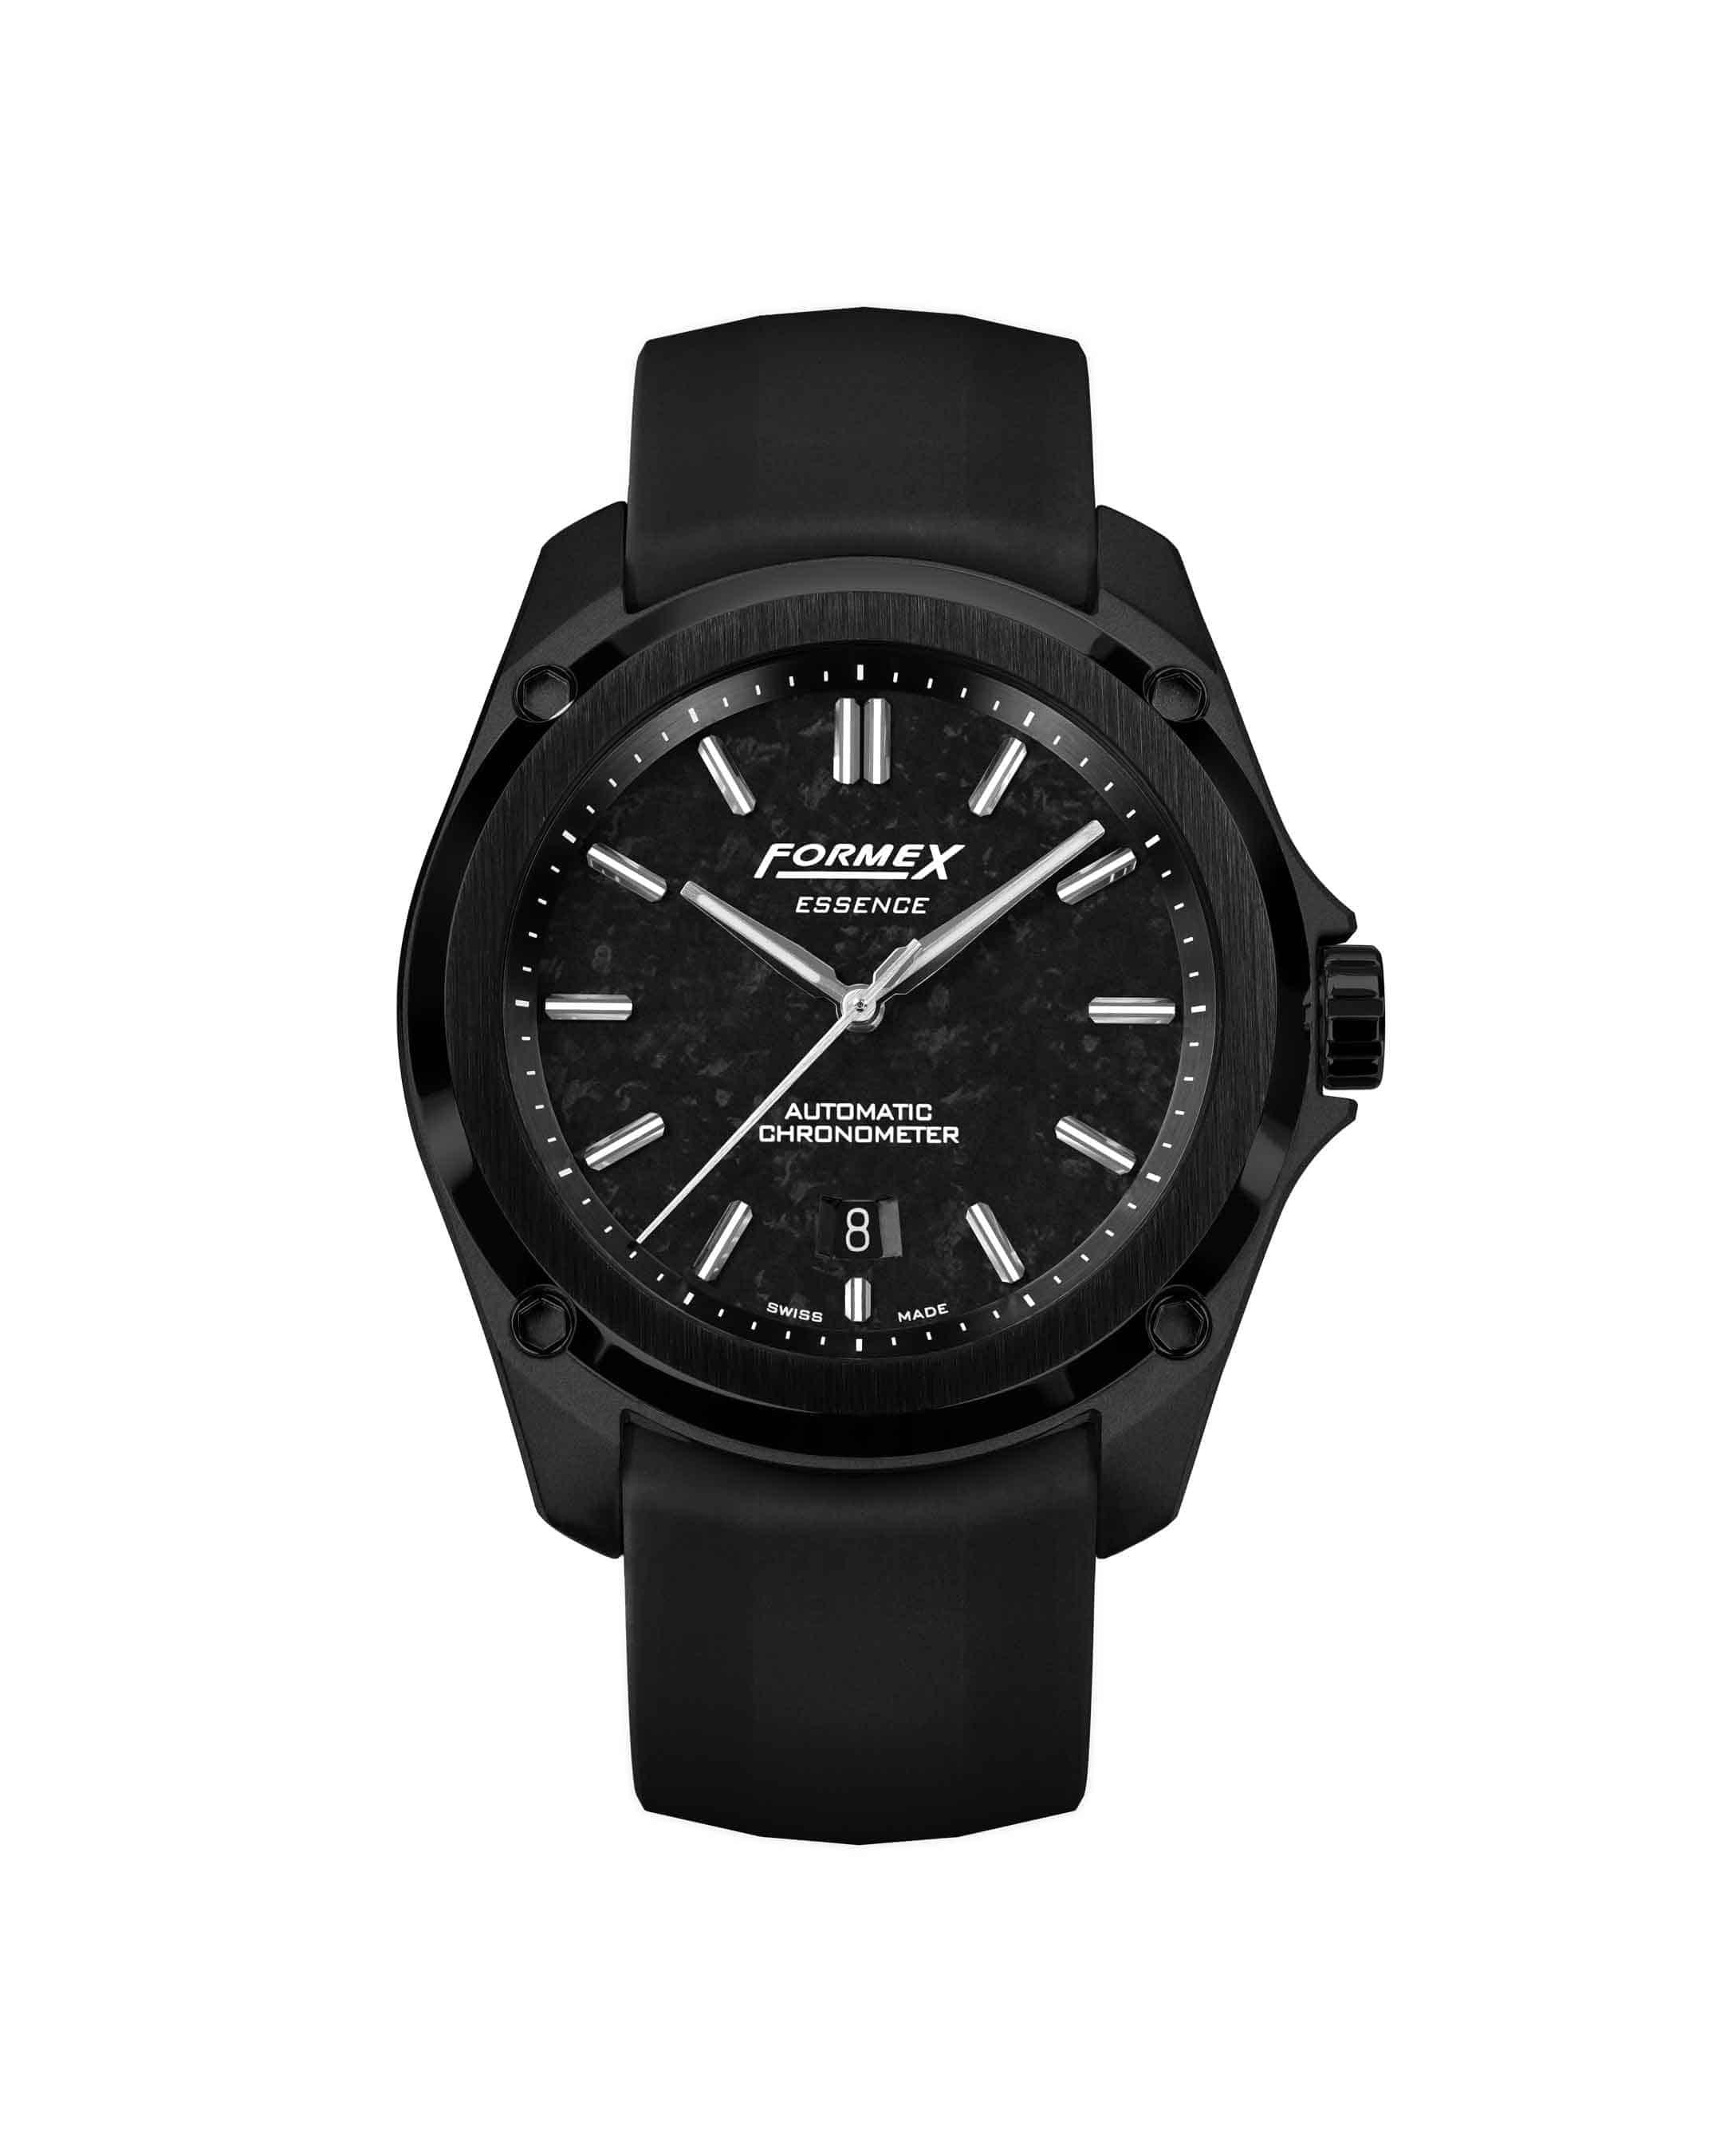 Formex-Essence-LEGGERA-Automatic-Chronometer-FORGED-CARBON-front